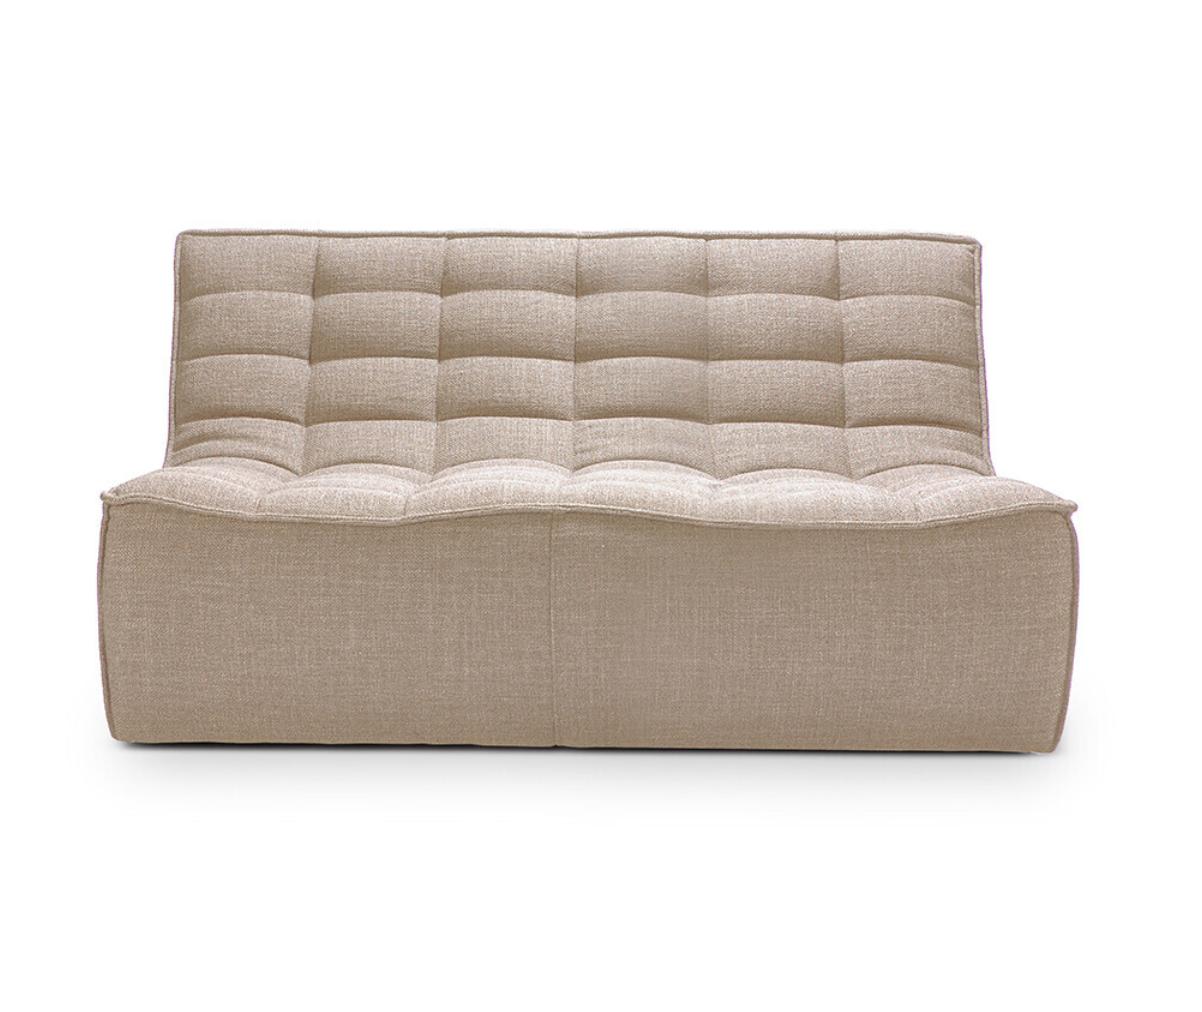 N701 sofa - 2 seater-1